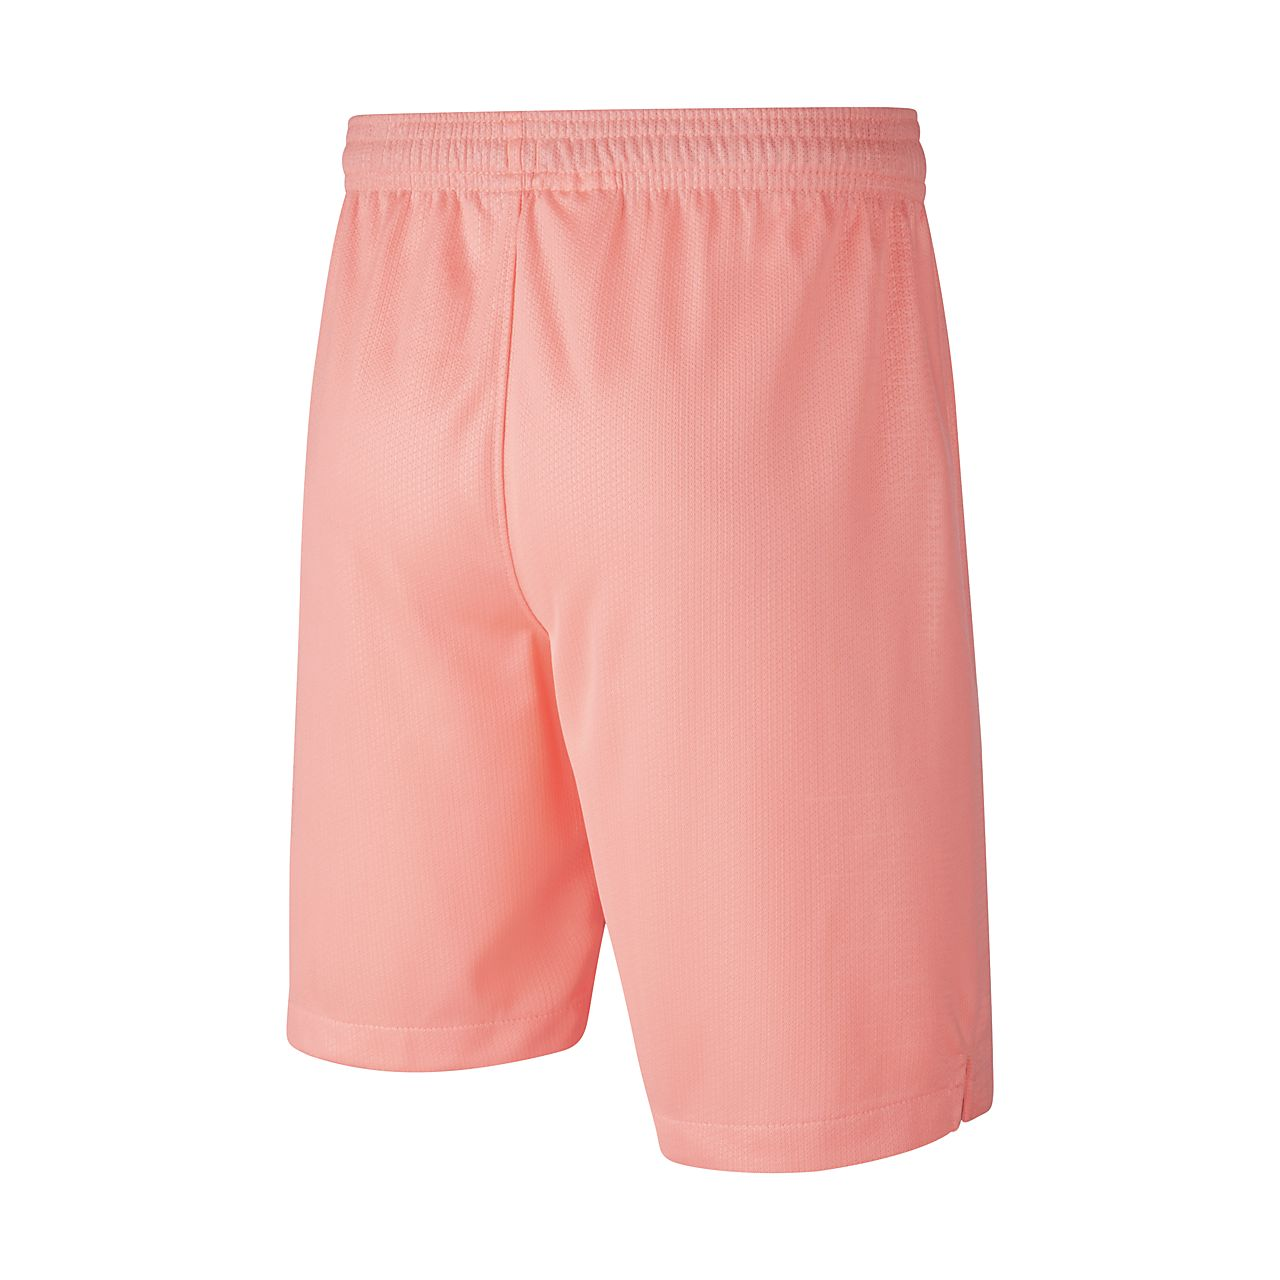 281e066f 2018/19 FC Barcelona Stadium Third Older Kids' Football Shorts. Nike ...